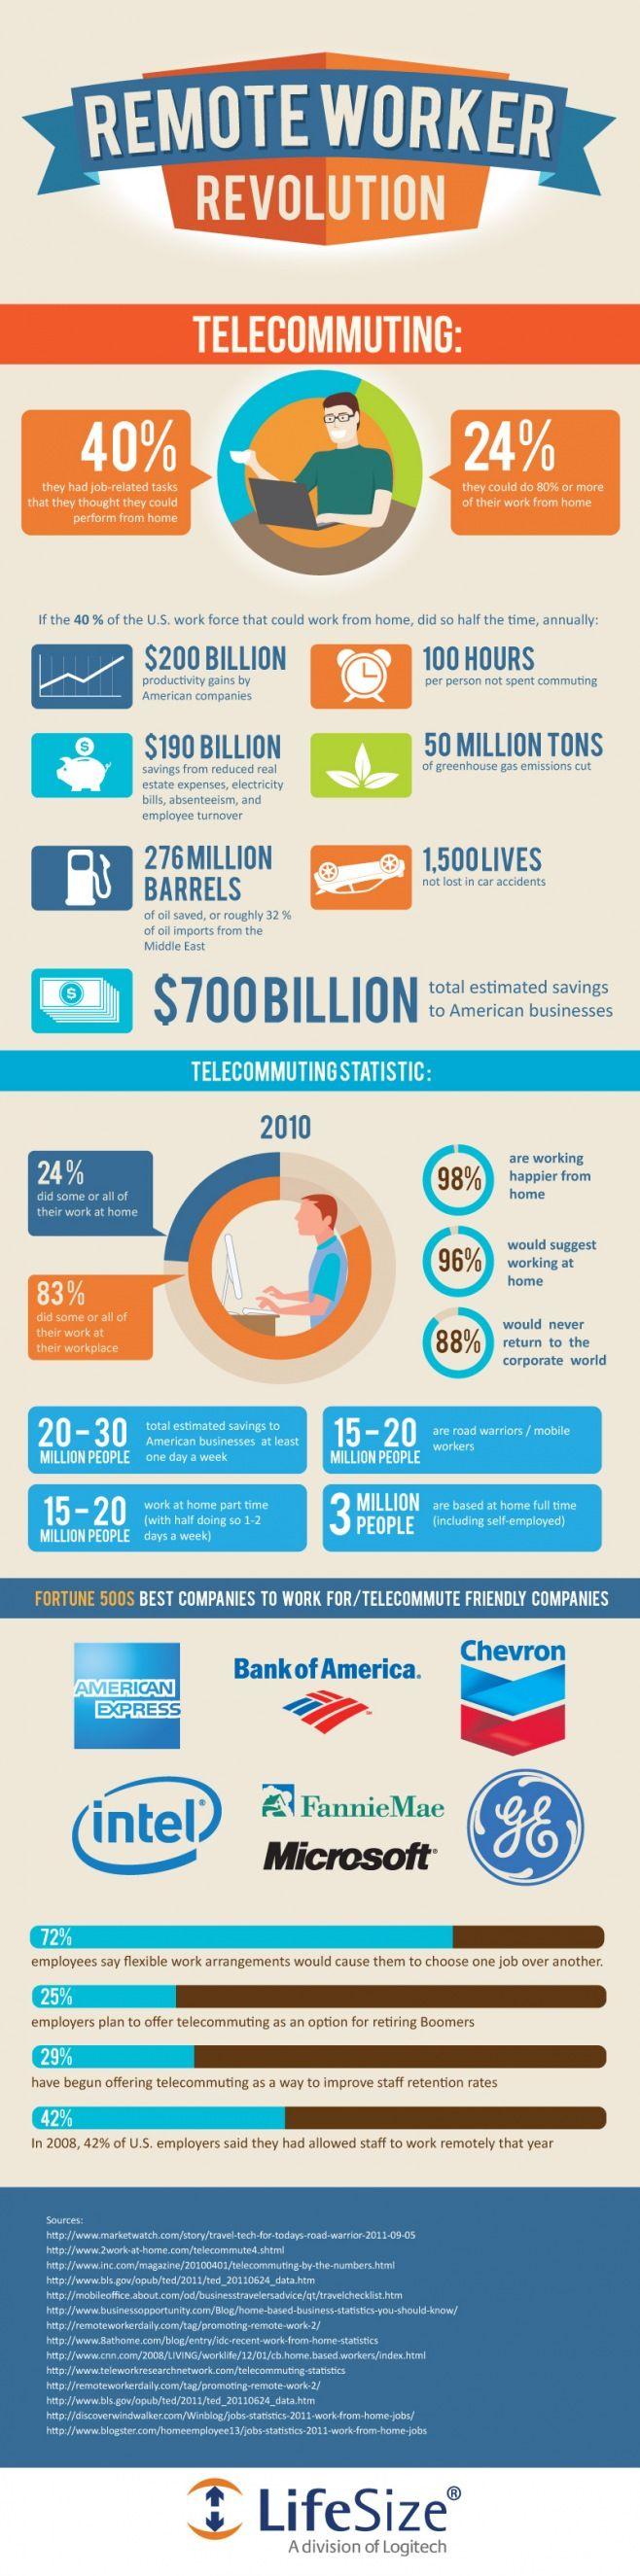 La revolucion del teletrabajo #infografia #infographic #internet vía @alfredovela